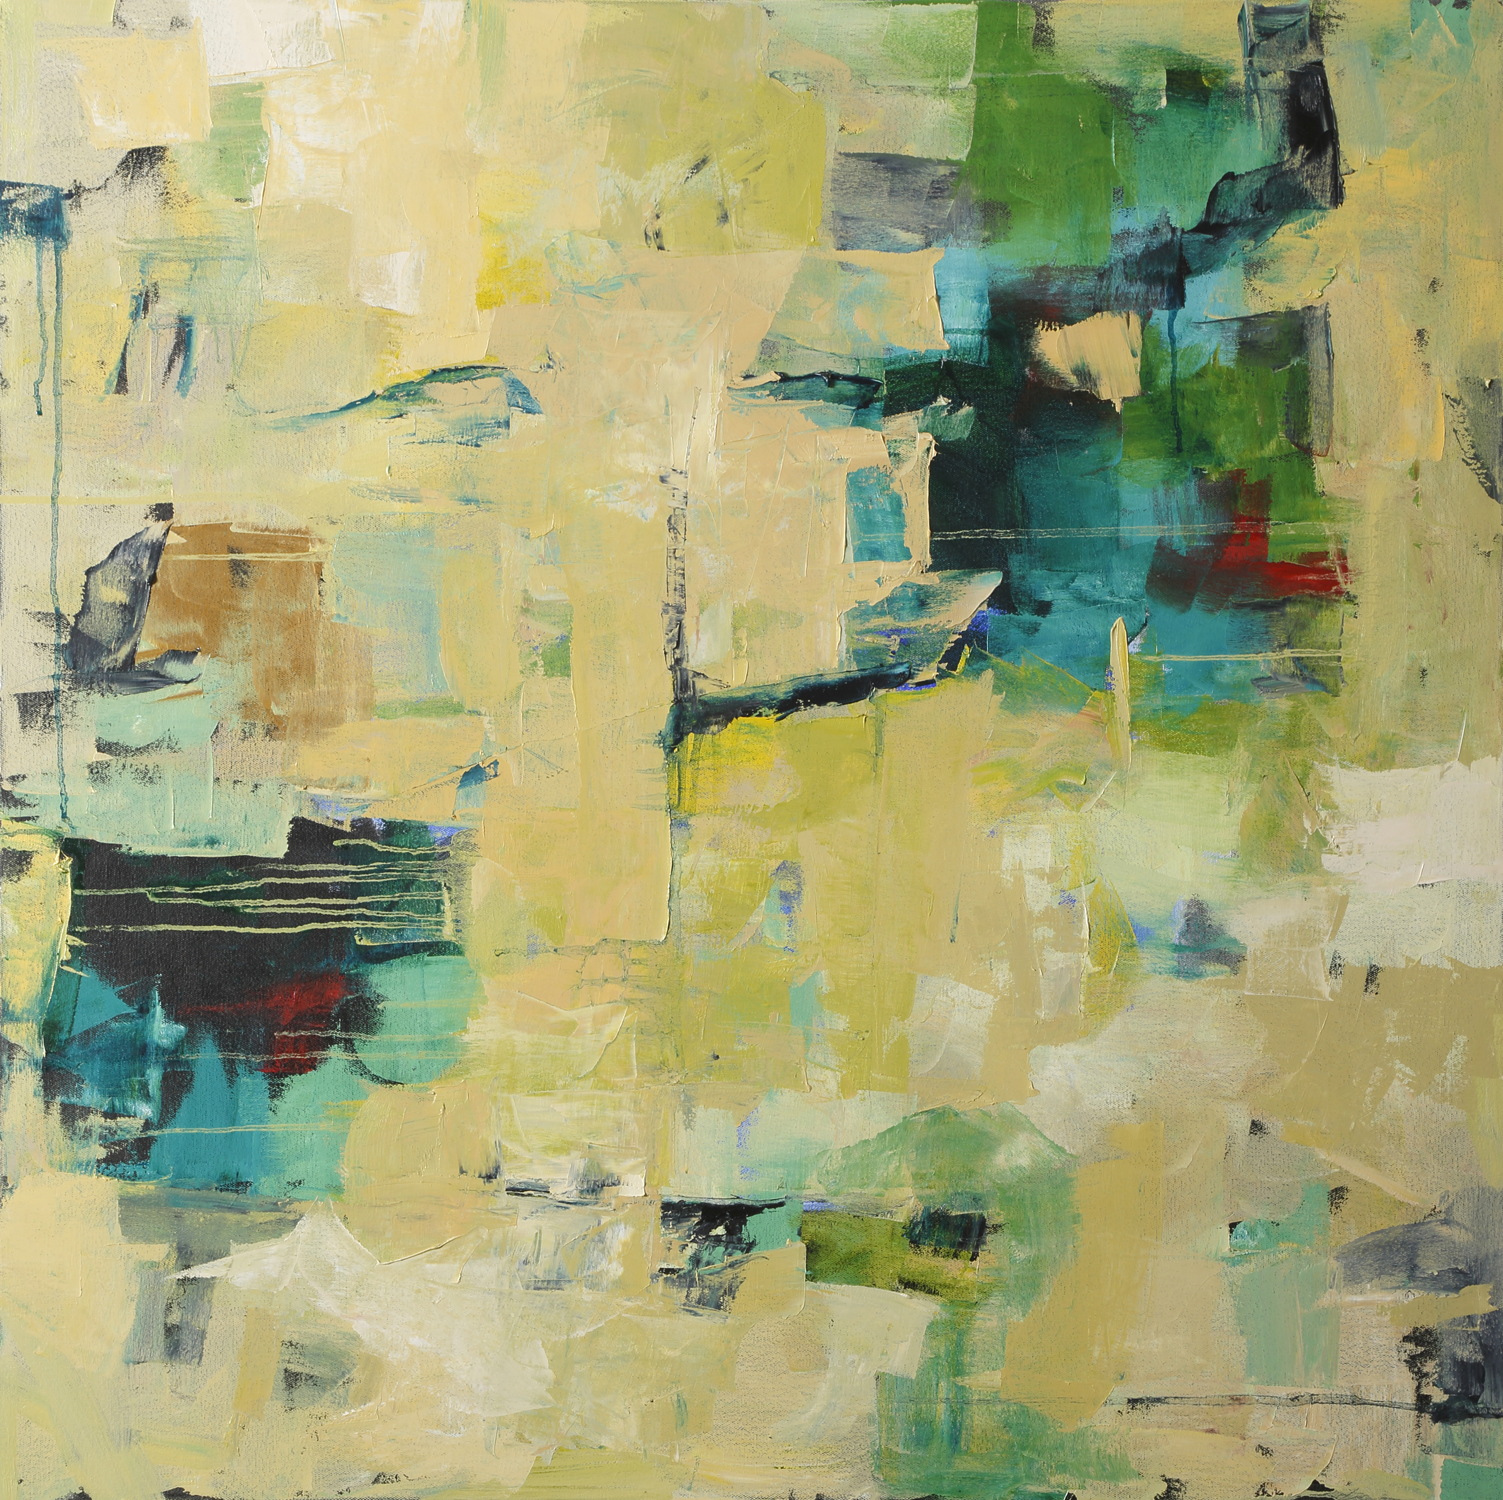 Sweet Secrets  36 x 36  Oil on canvas  Sold